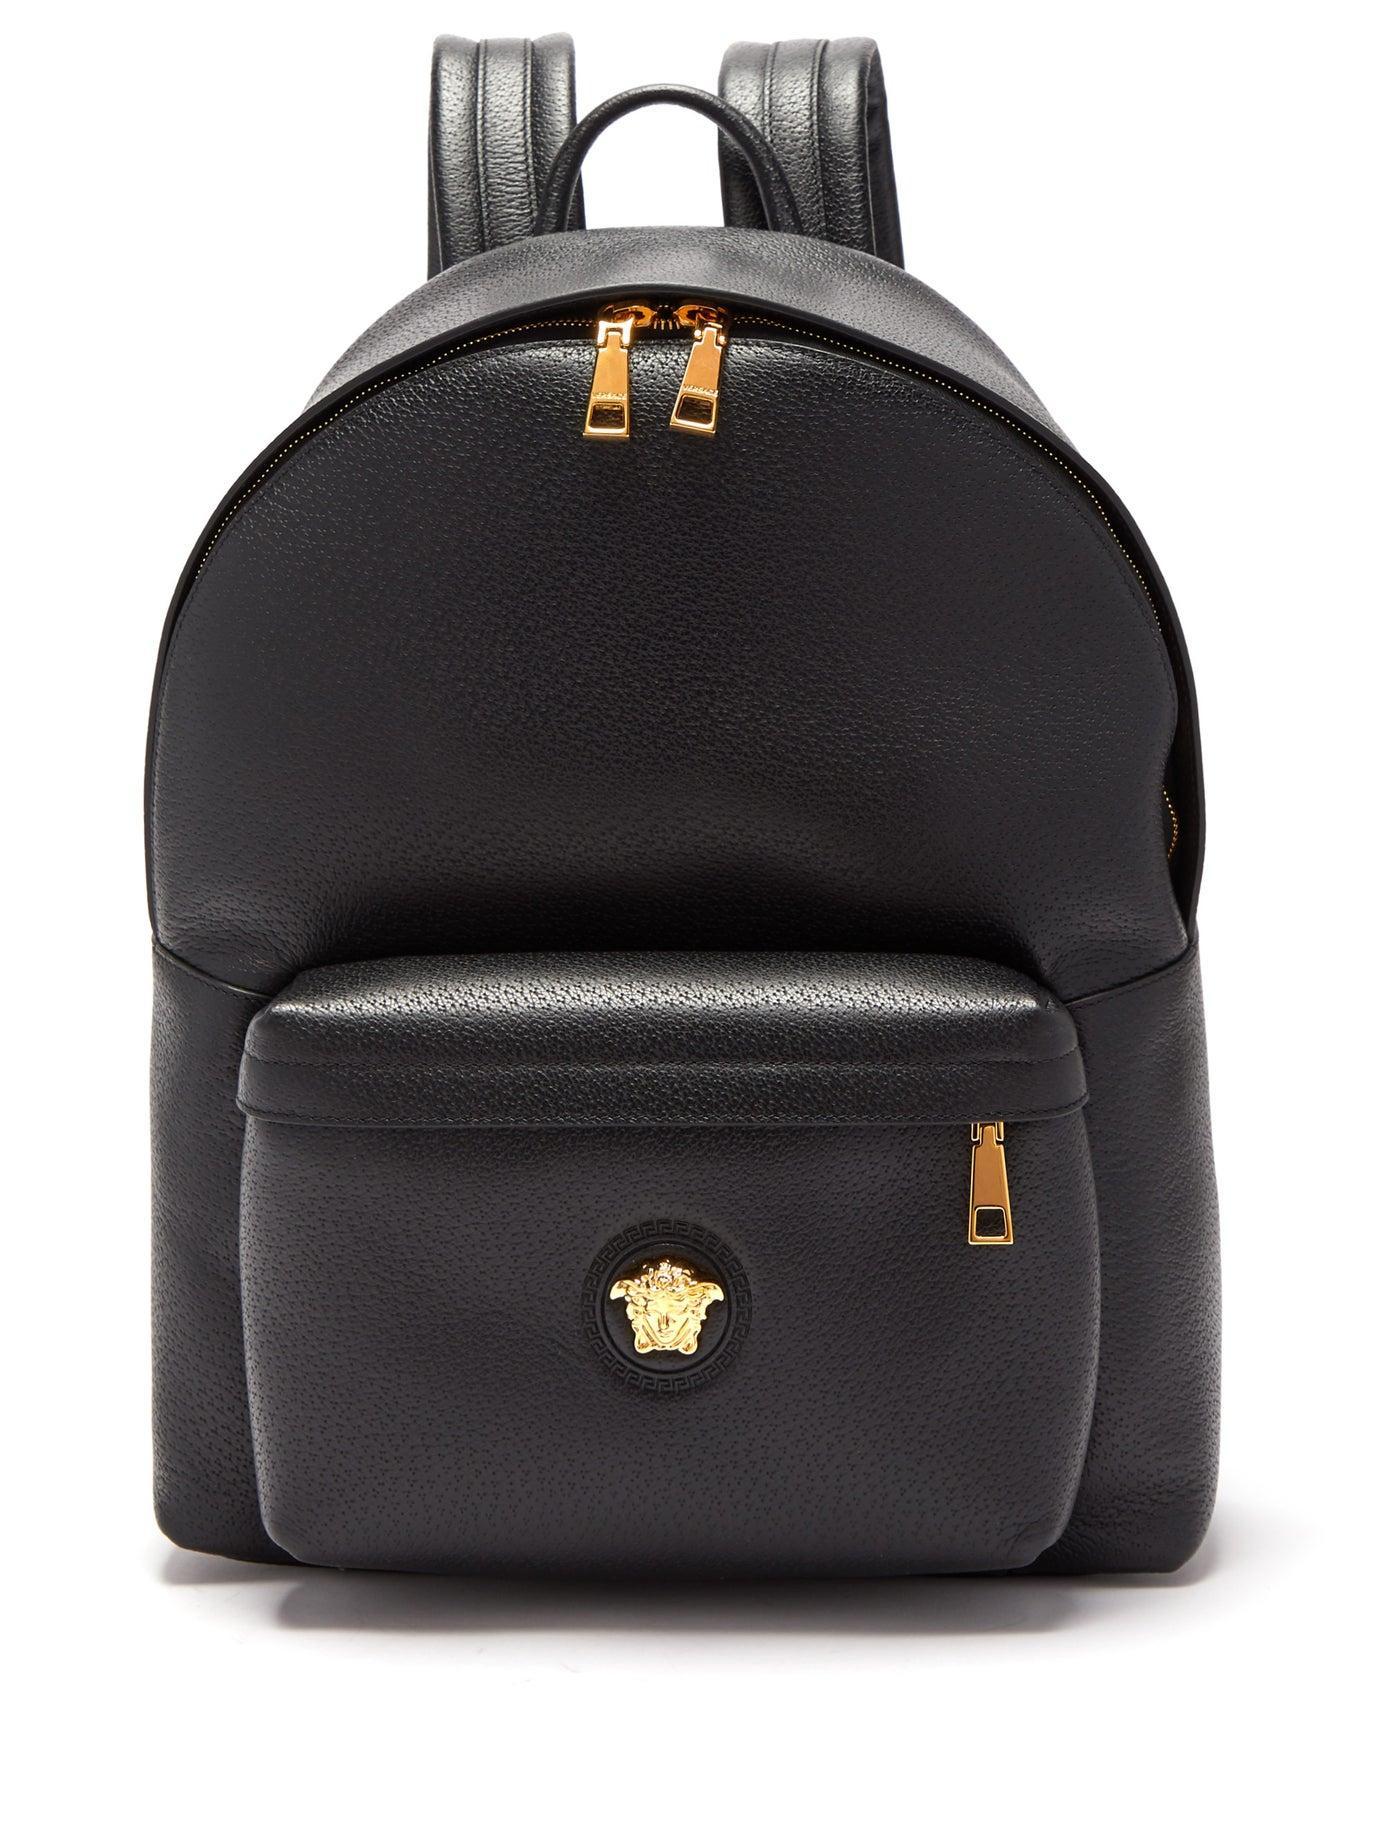 2940b54d450 Versace Medusa Head Leather Backpack in Black for Men - Lyst